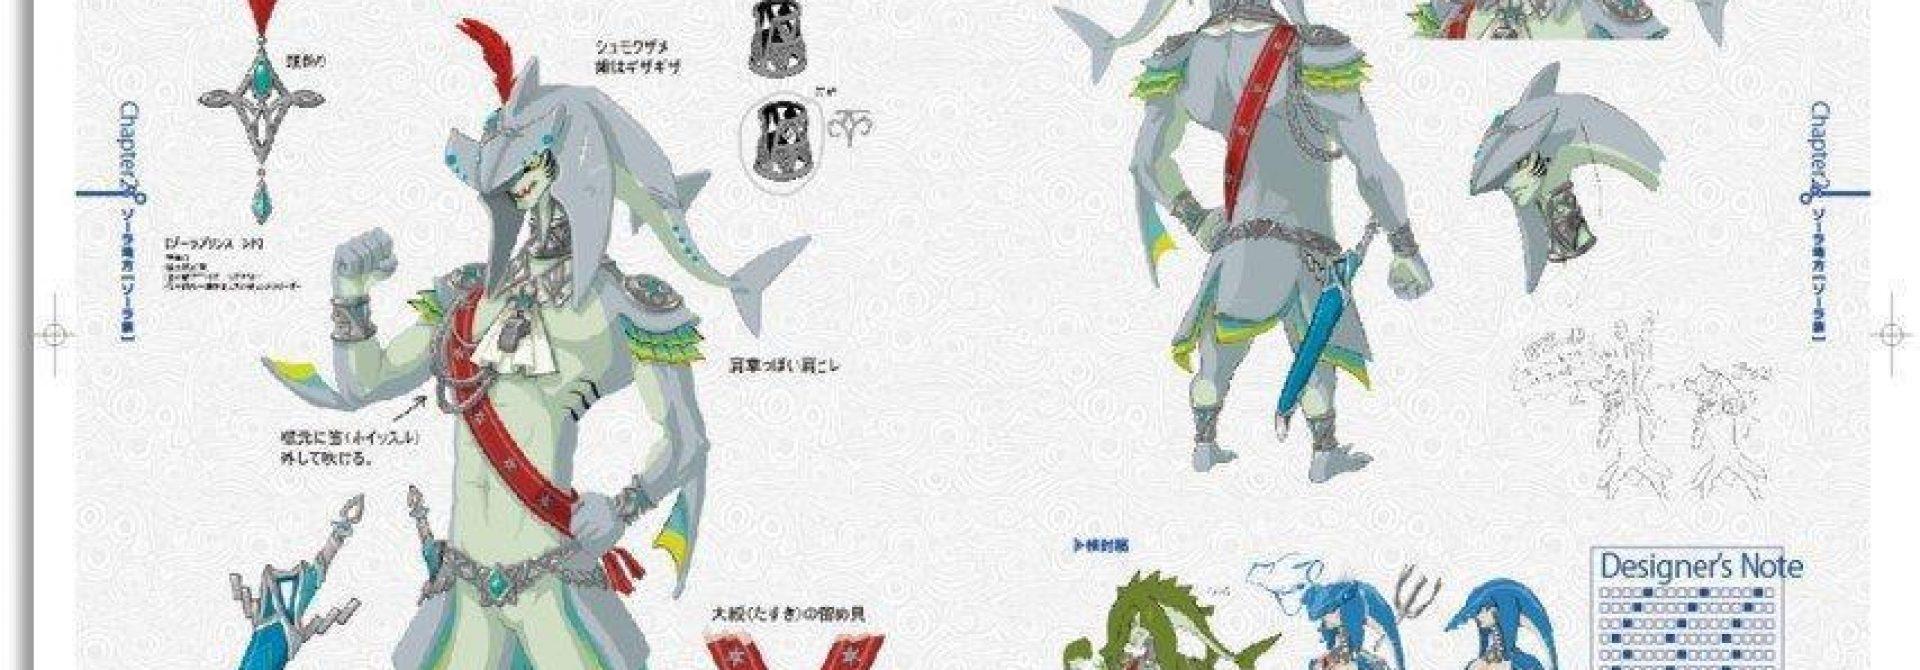 Zelda: Breath Of The Wild Artbook On The Way